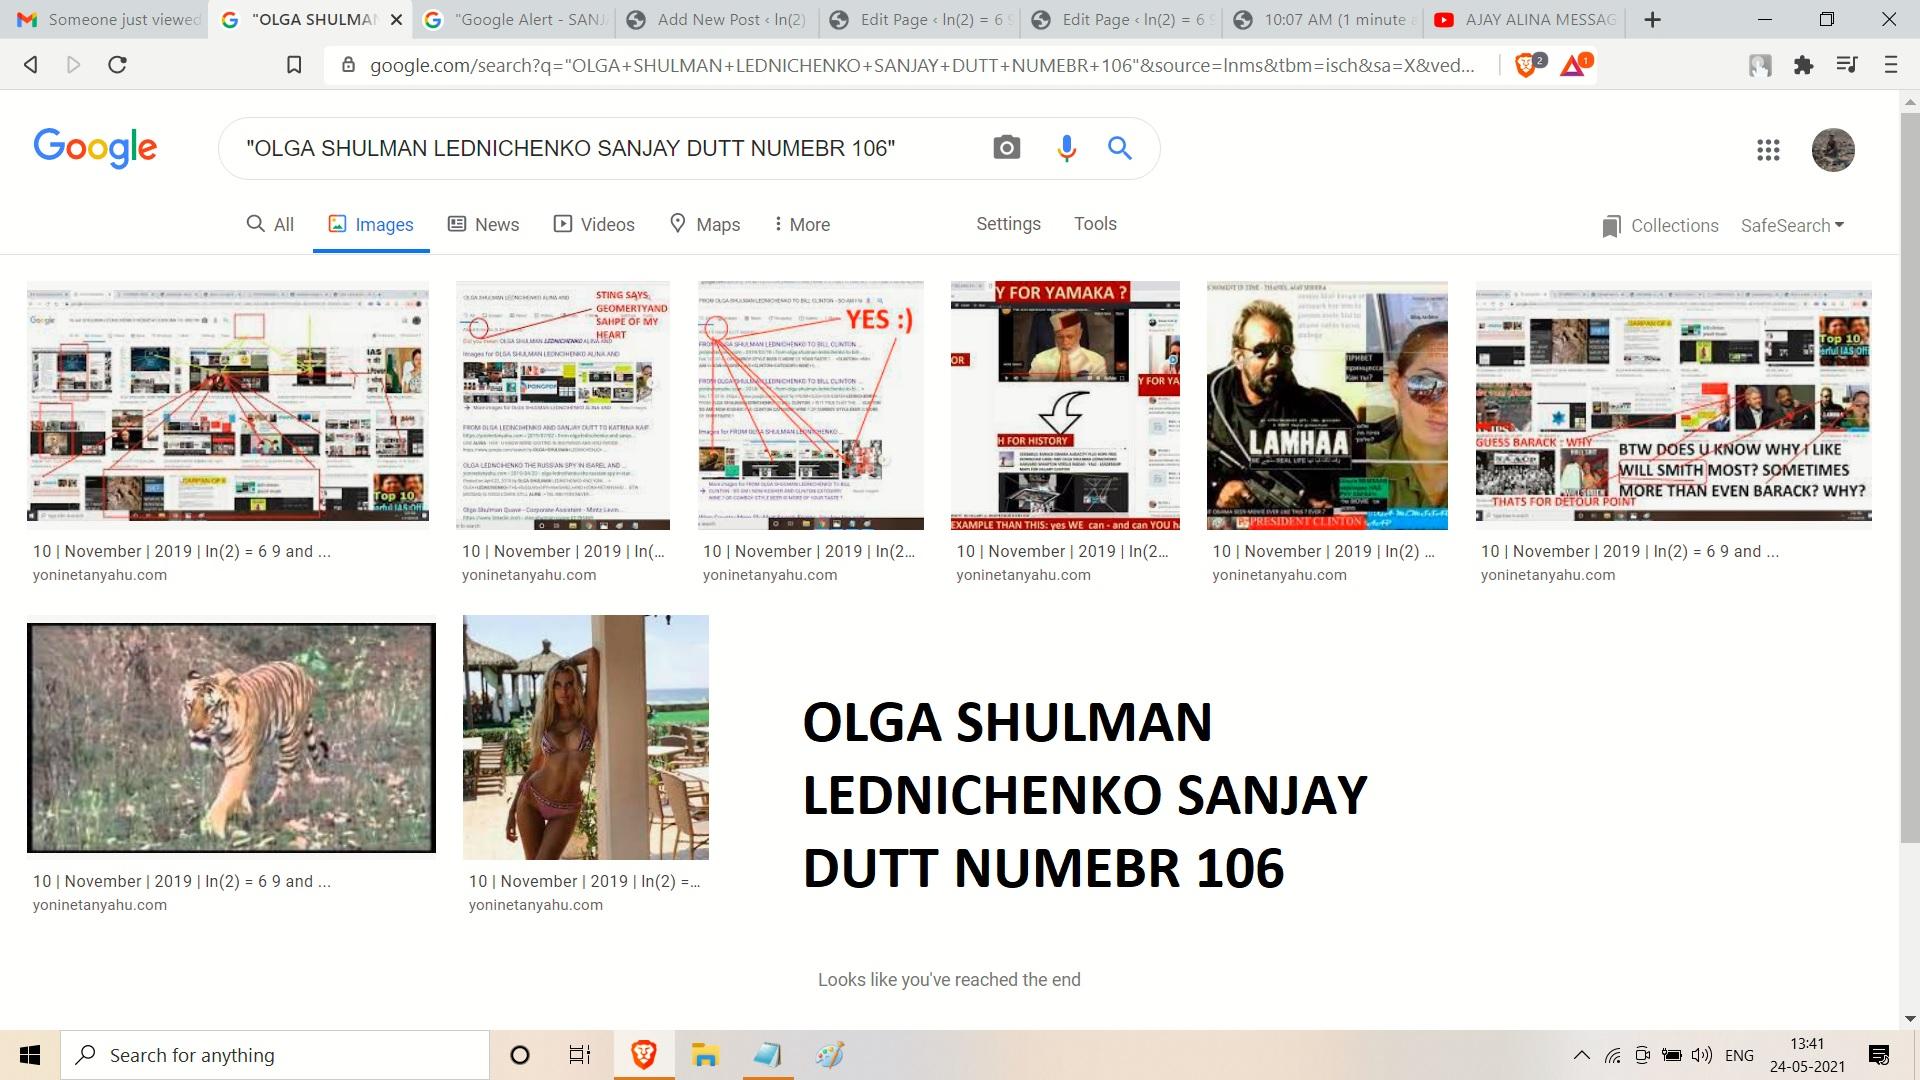 OLGA SHULMAN LEDNICHENKO SANJAY DUTT NUMEBR 106